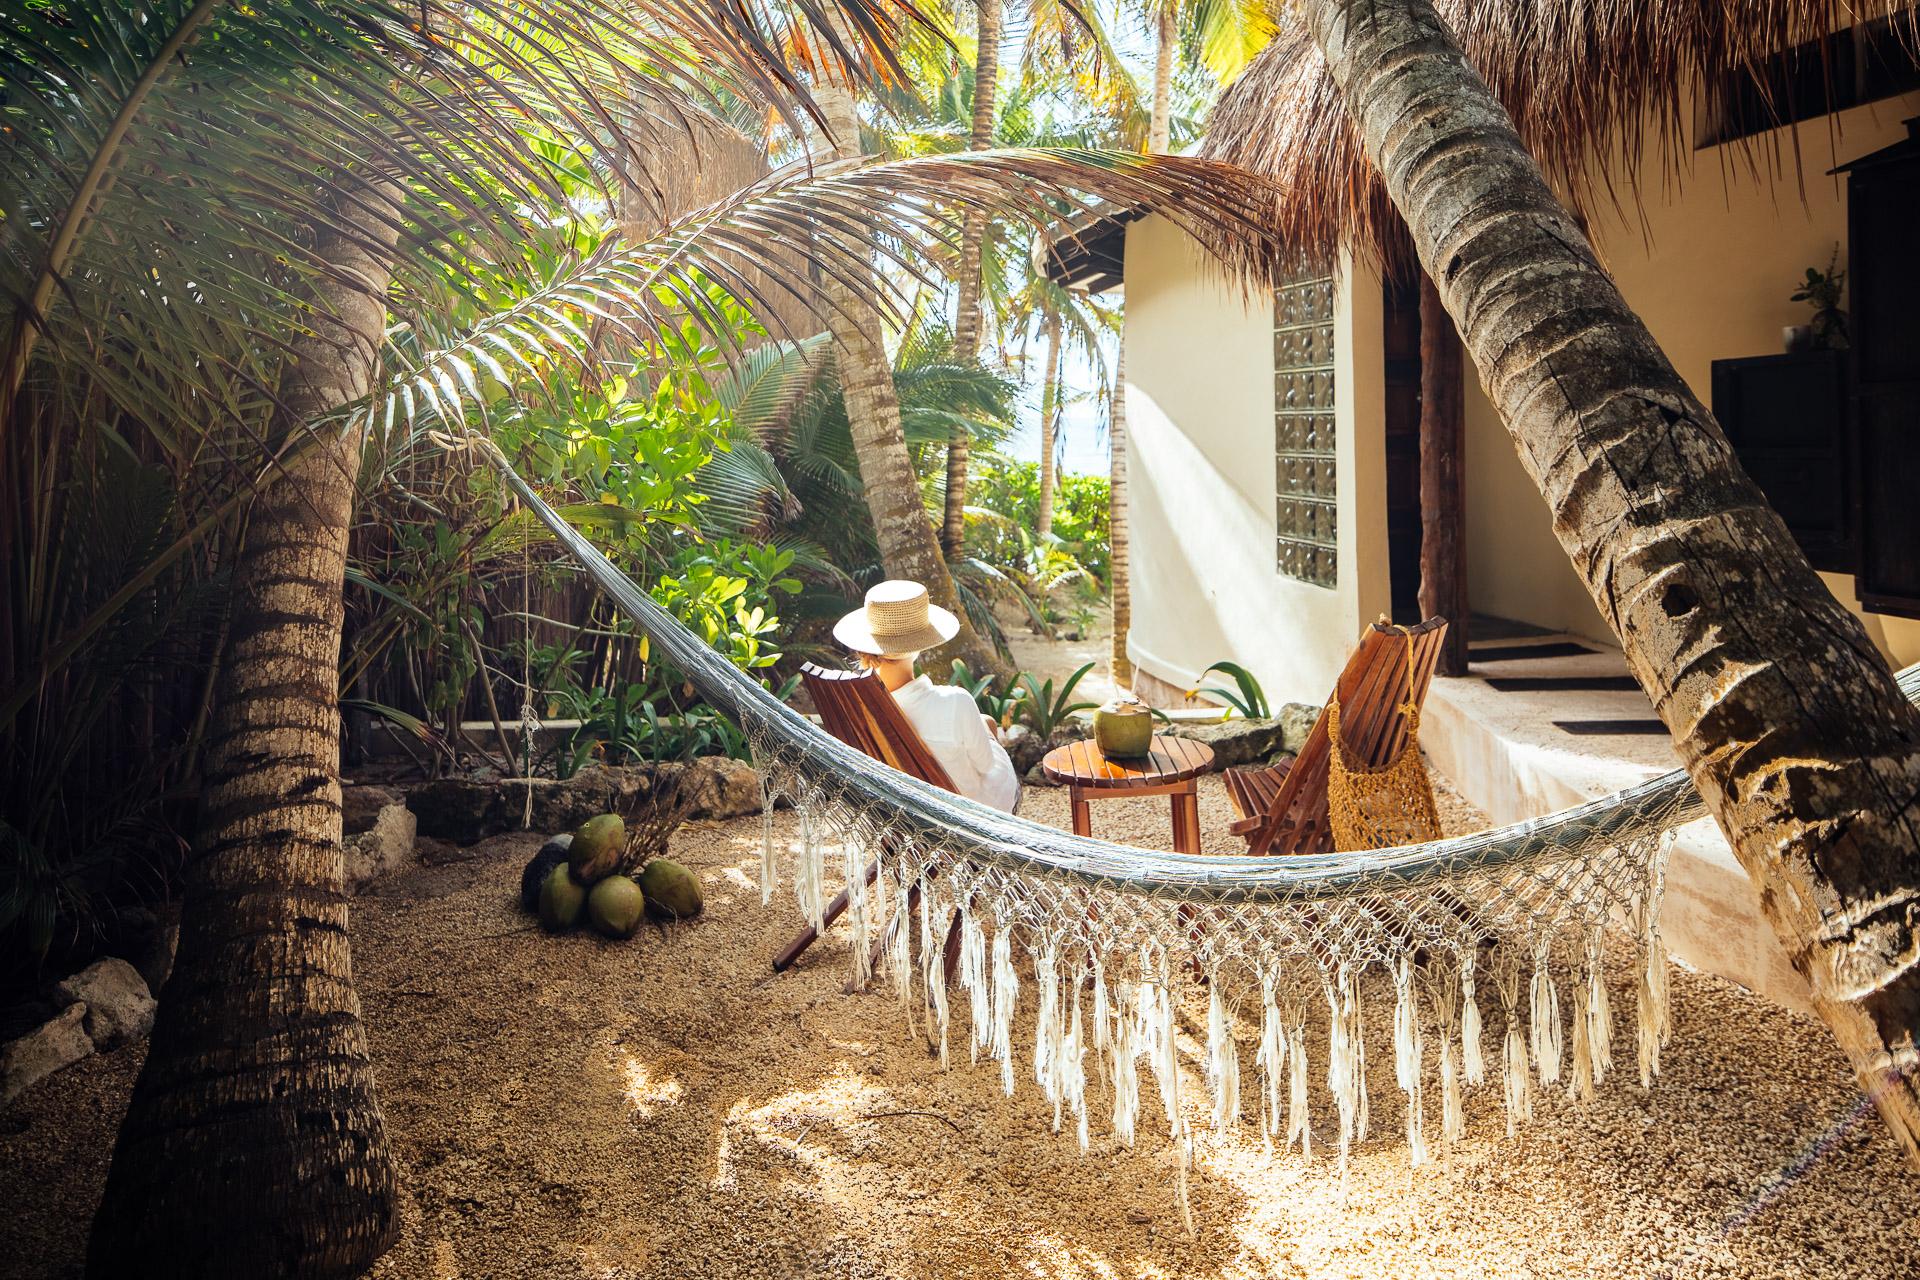 caribbean-hotel-resort-photographer-olas-tulum-mexico--2.jpg